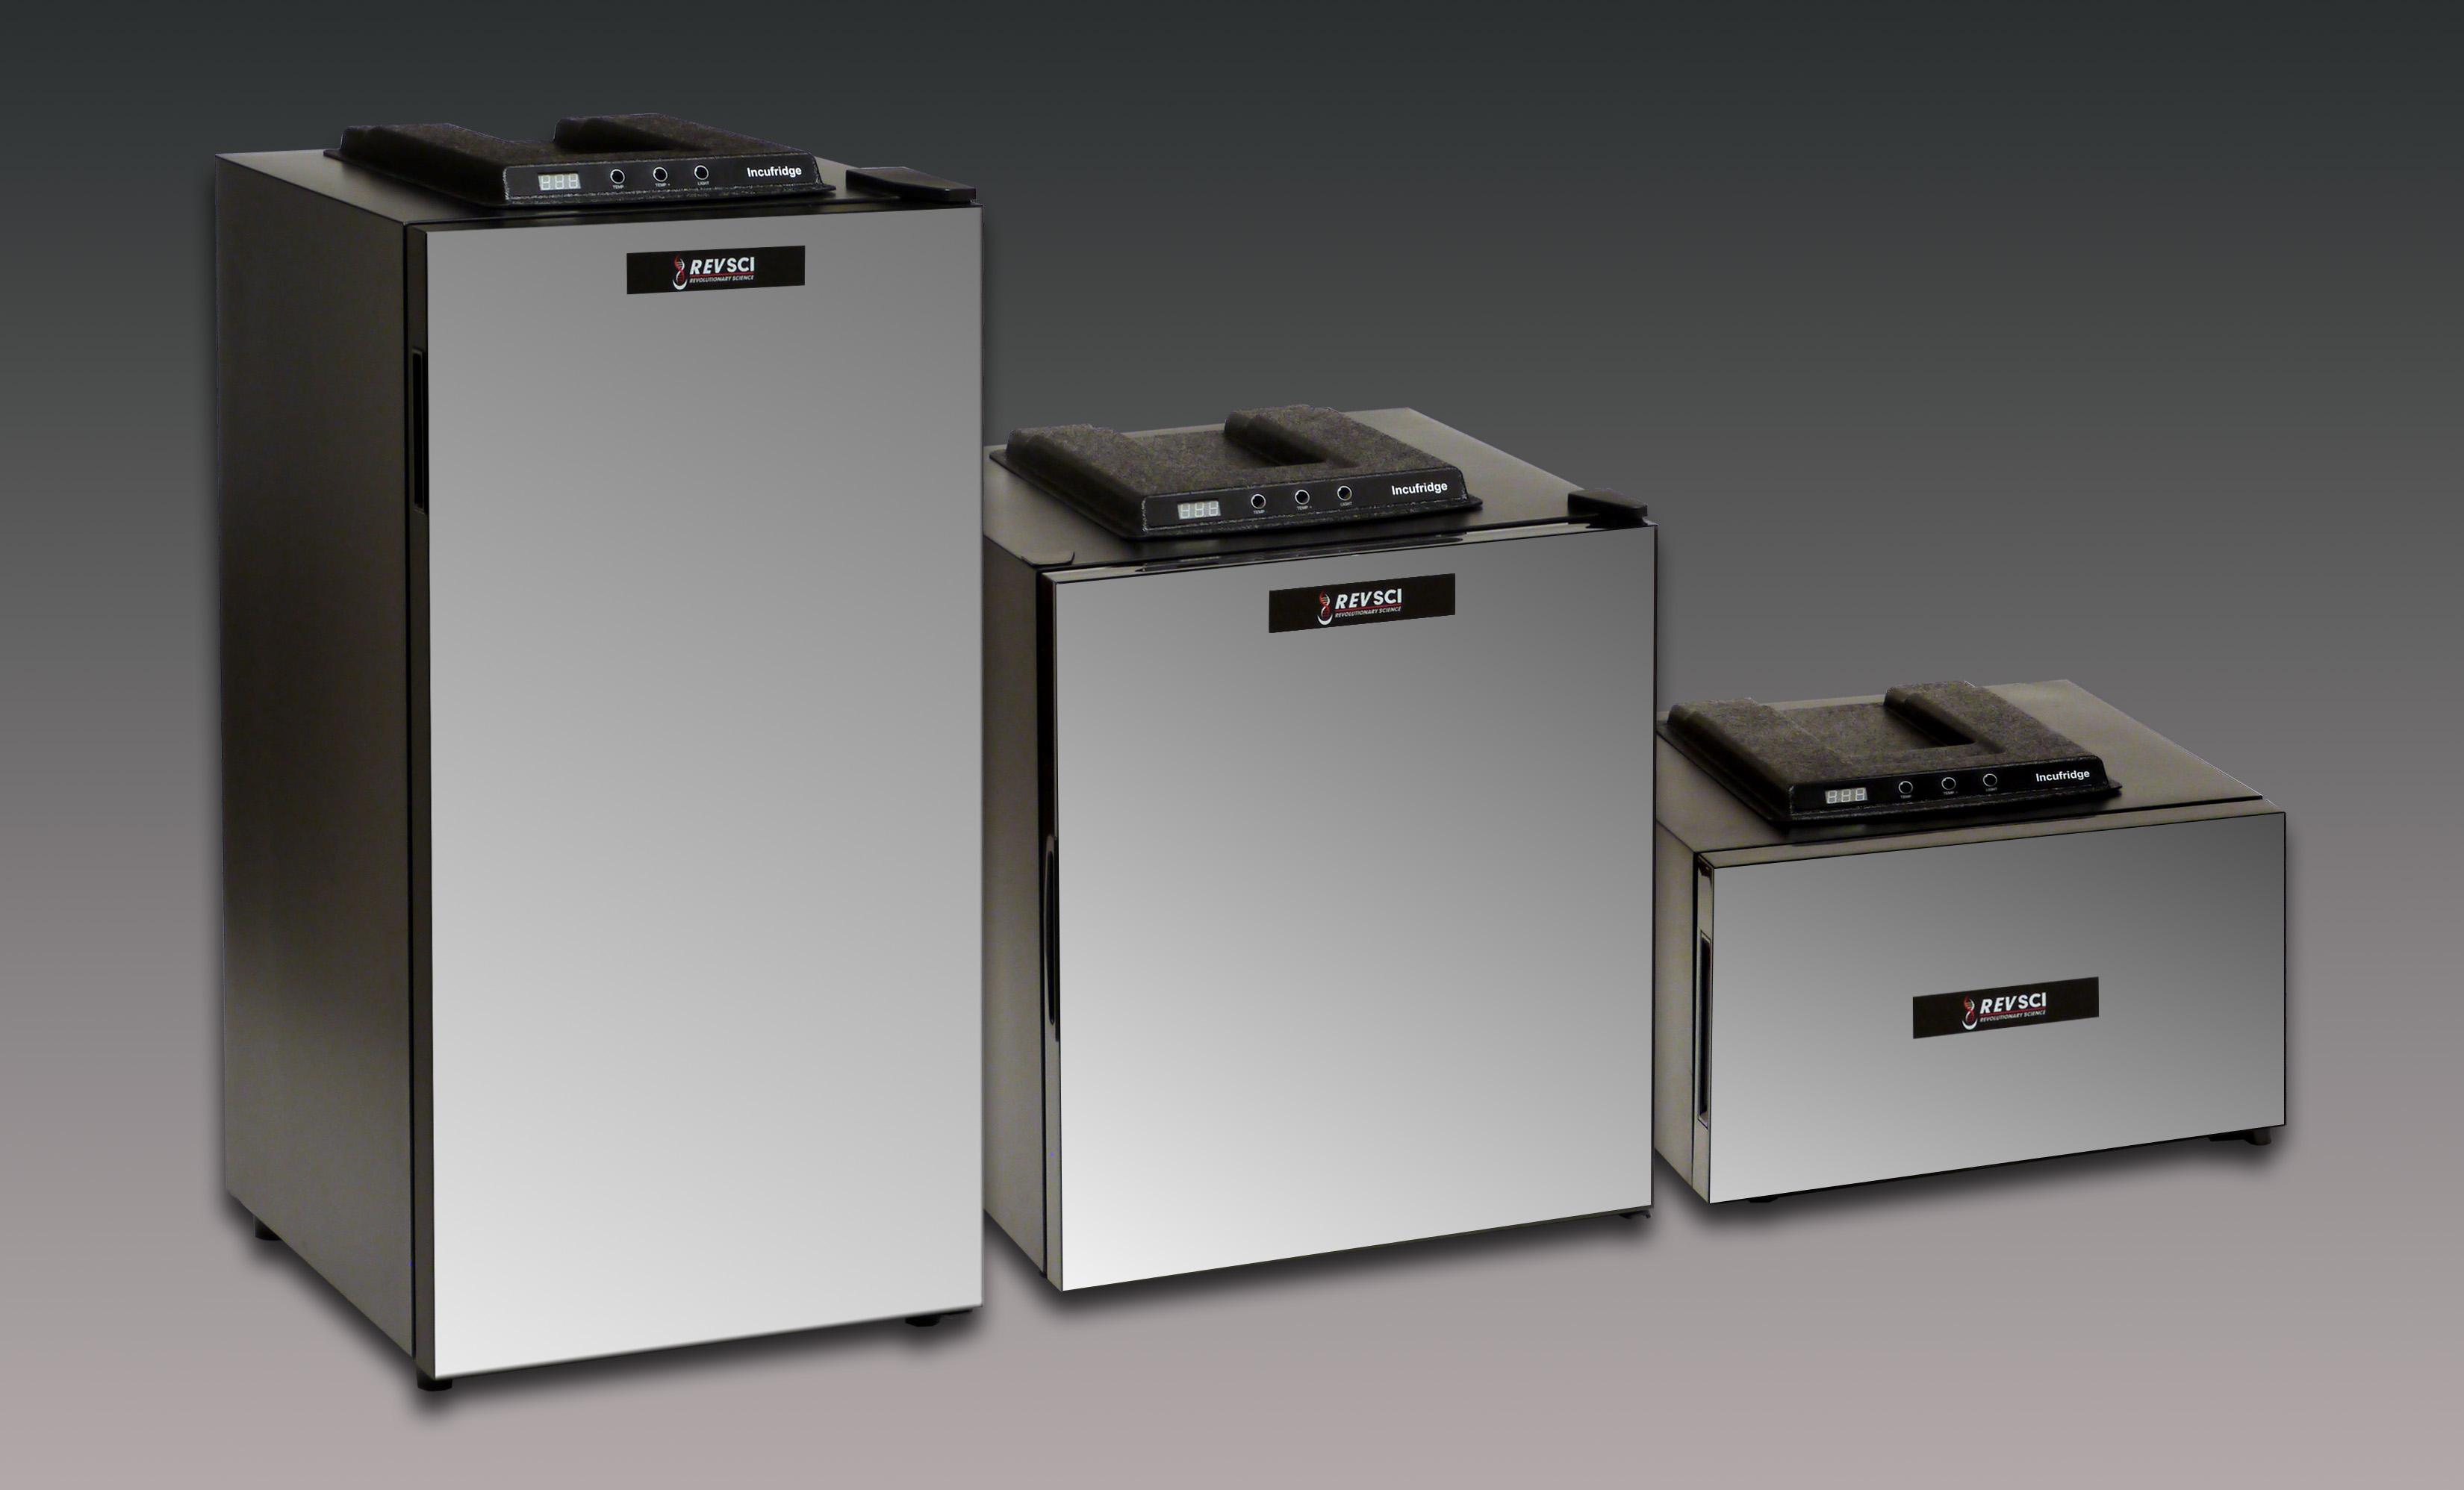 Groundbreaking New Incubator Technology Allows for Temperature Control  #5E5A51